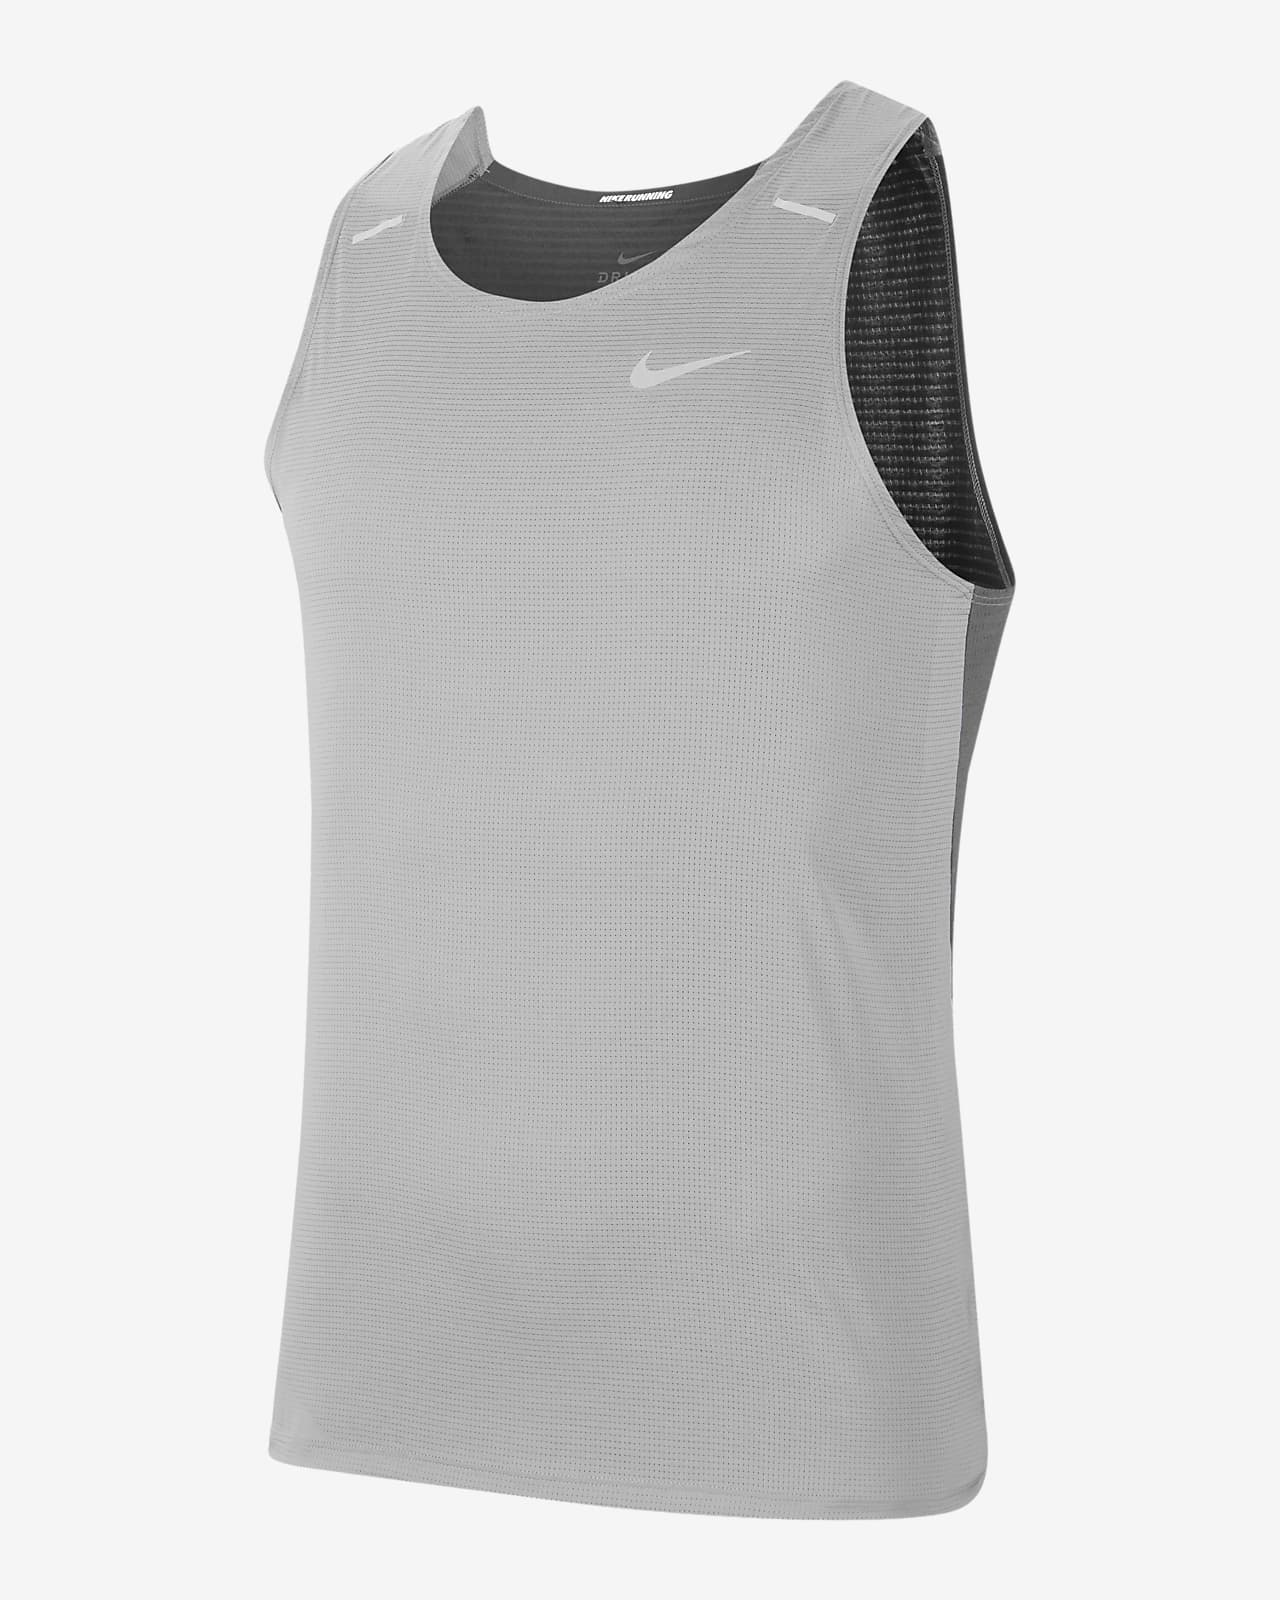 Camisola de running híbrida sem mangas Nike Breathe Rise 365 para homem